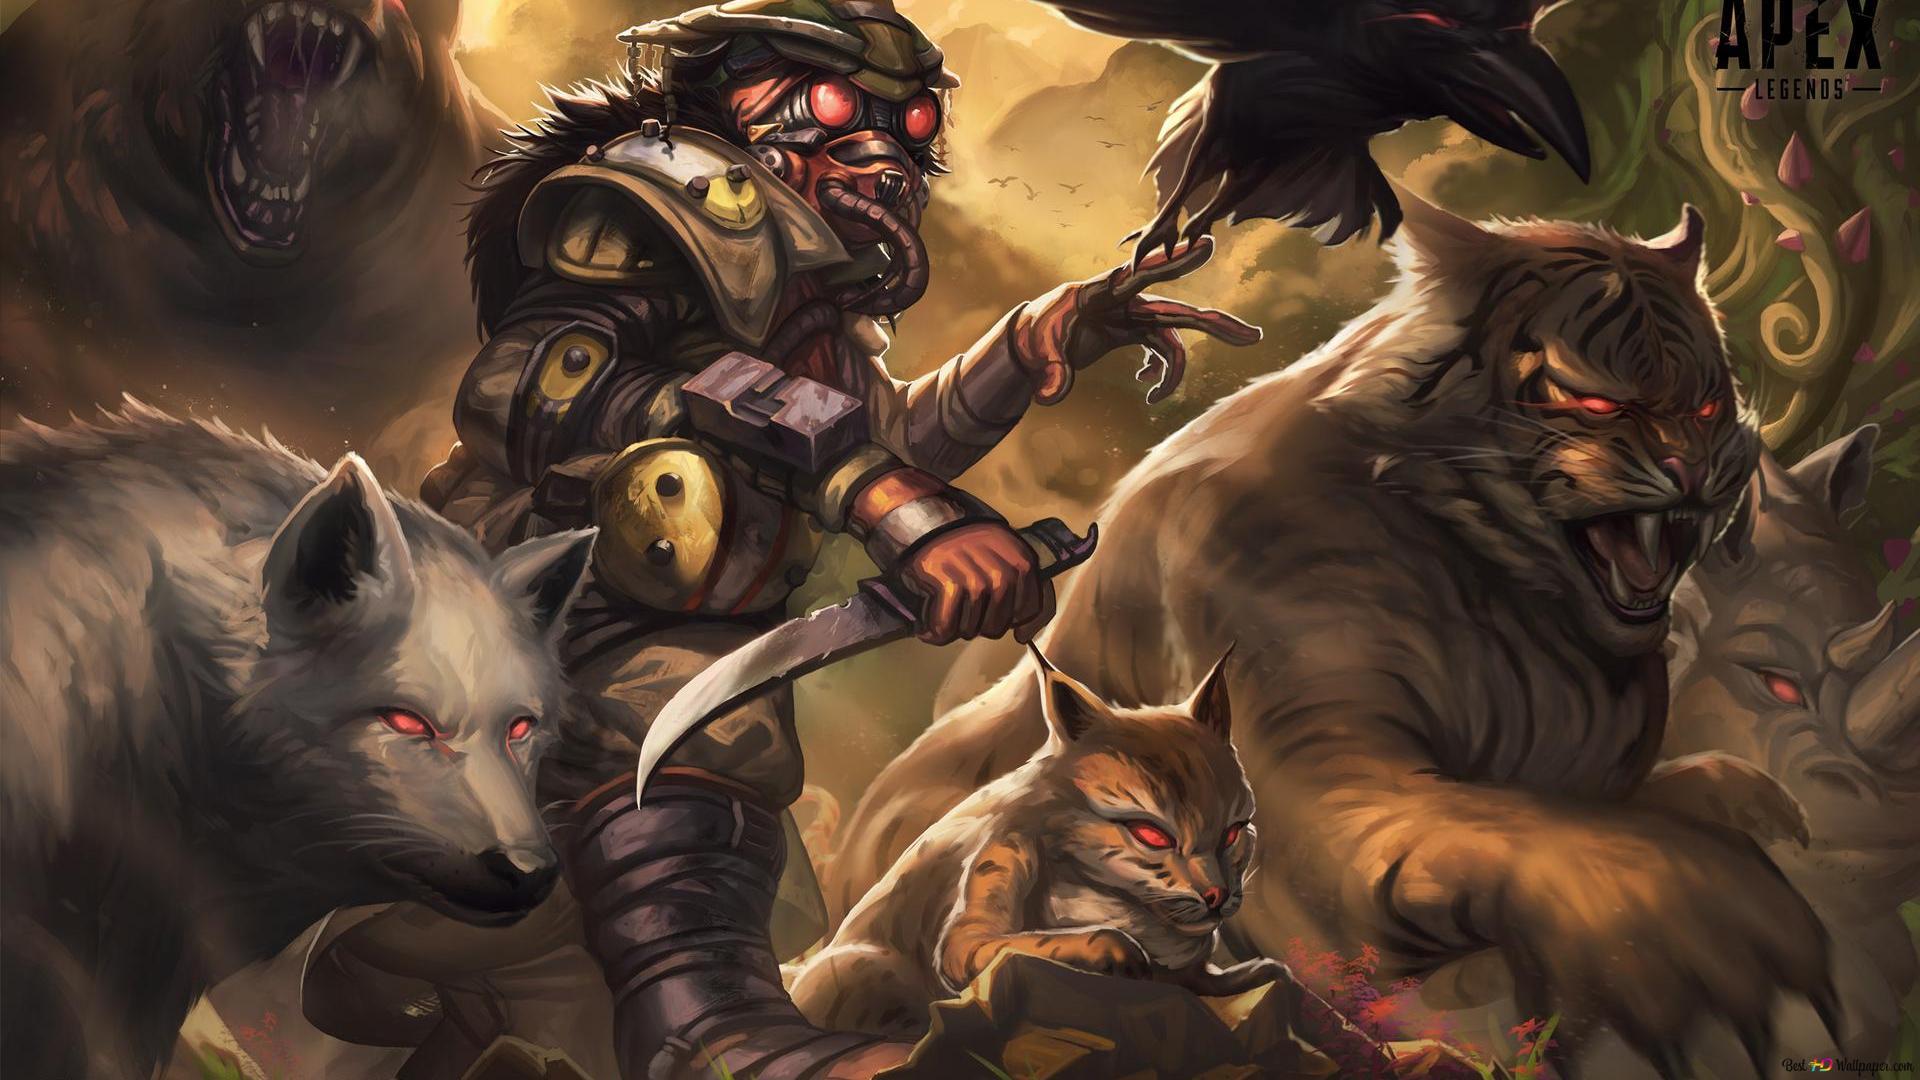 Bloodhound Apex Legends Hd Wallpaper Download